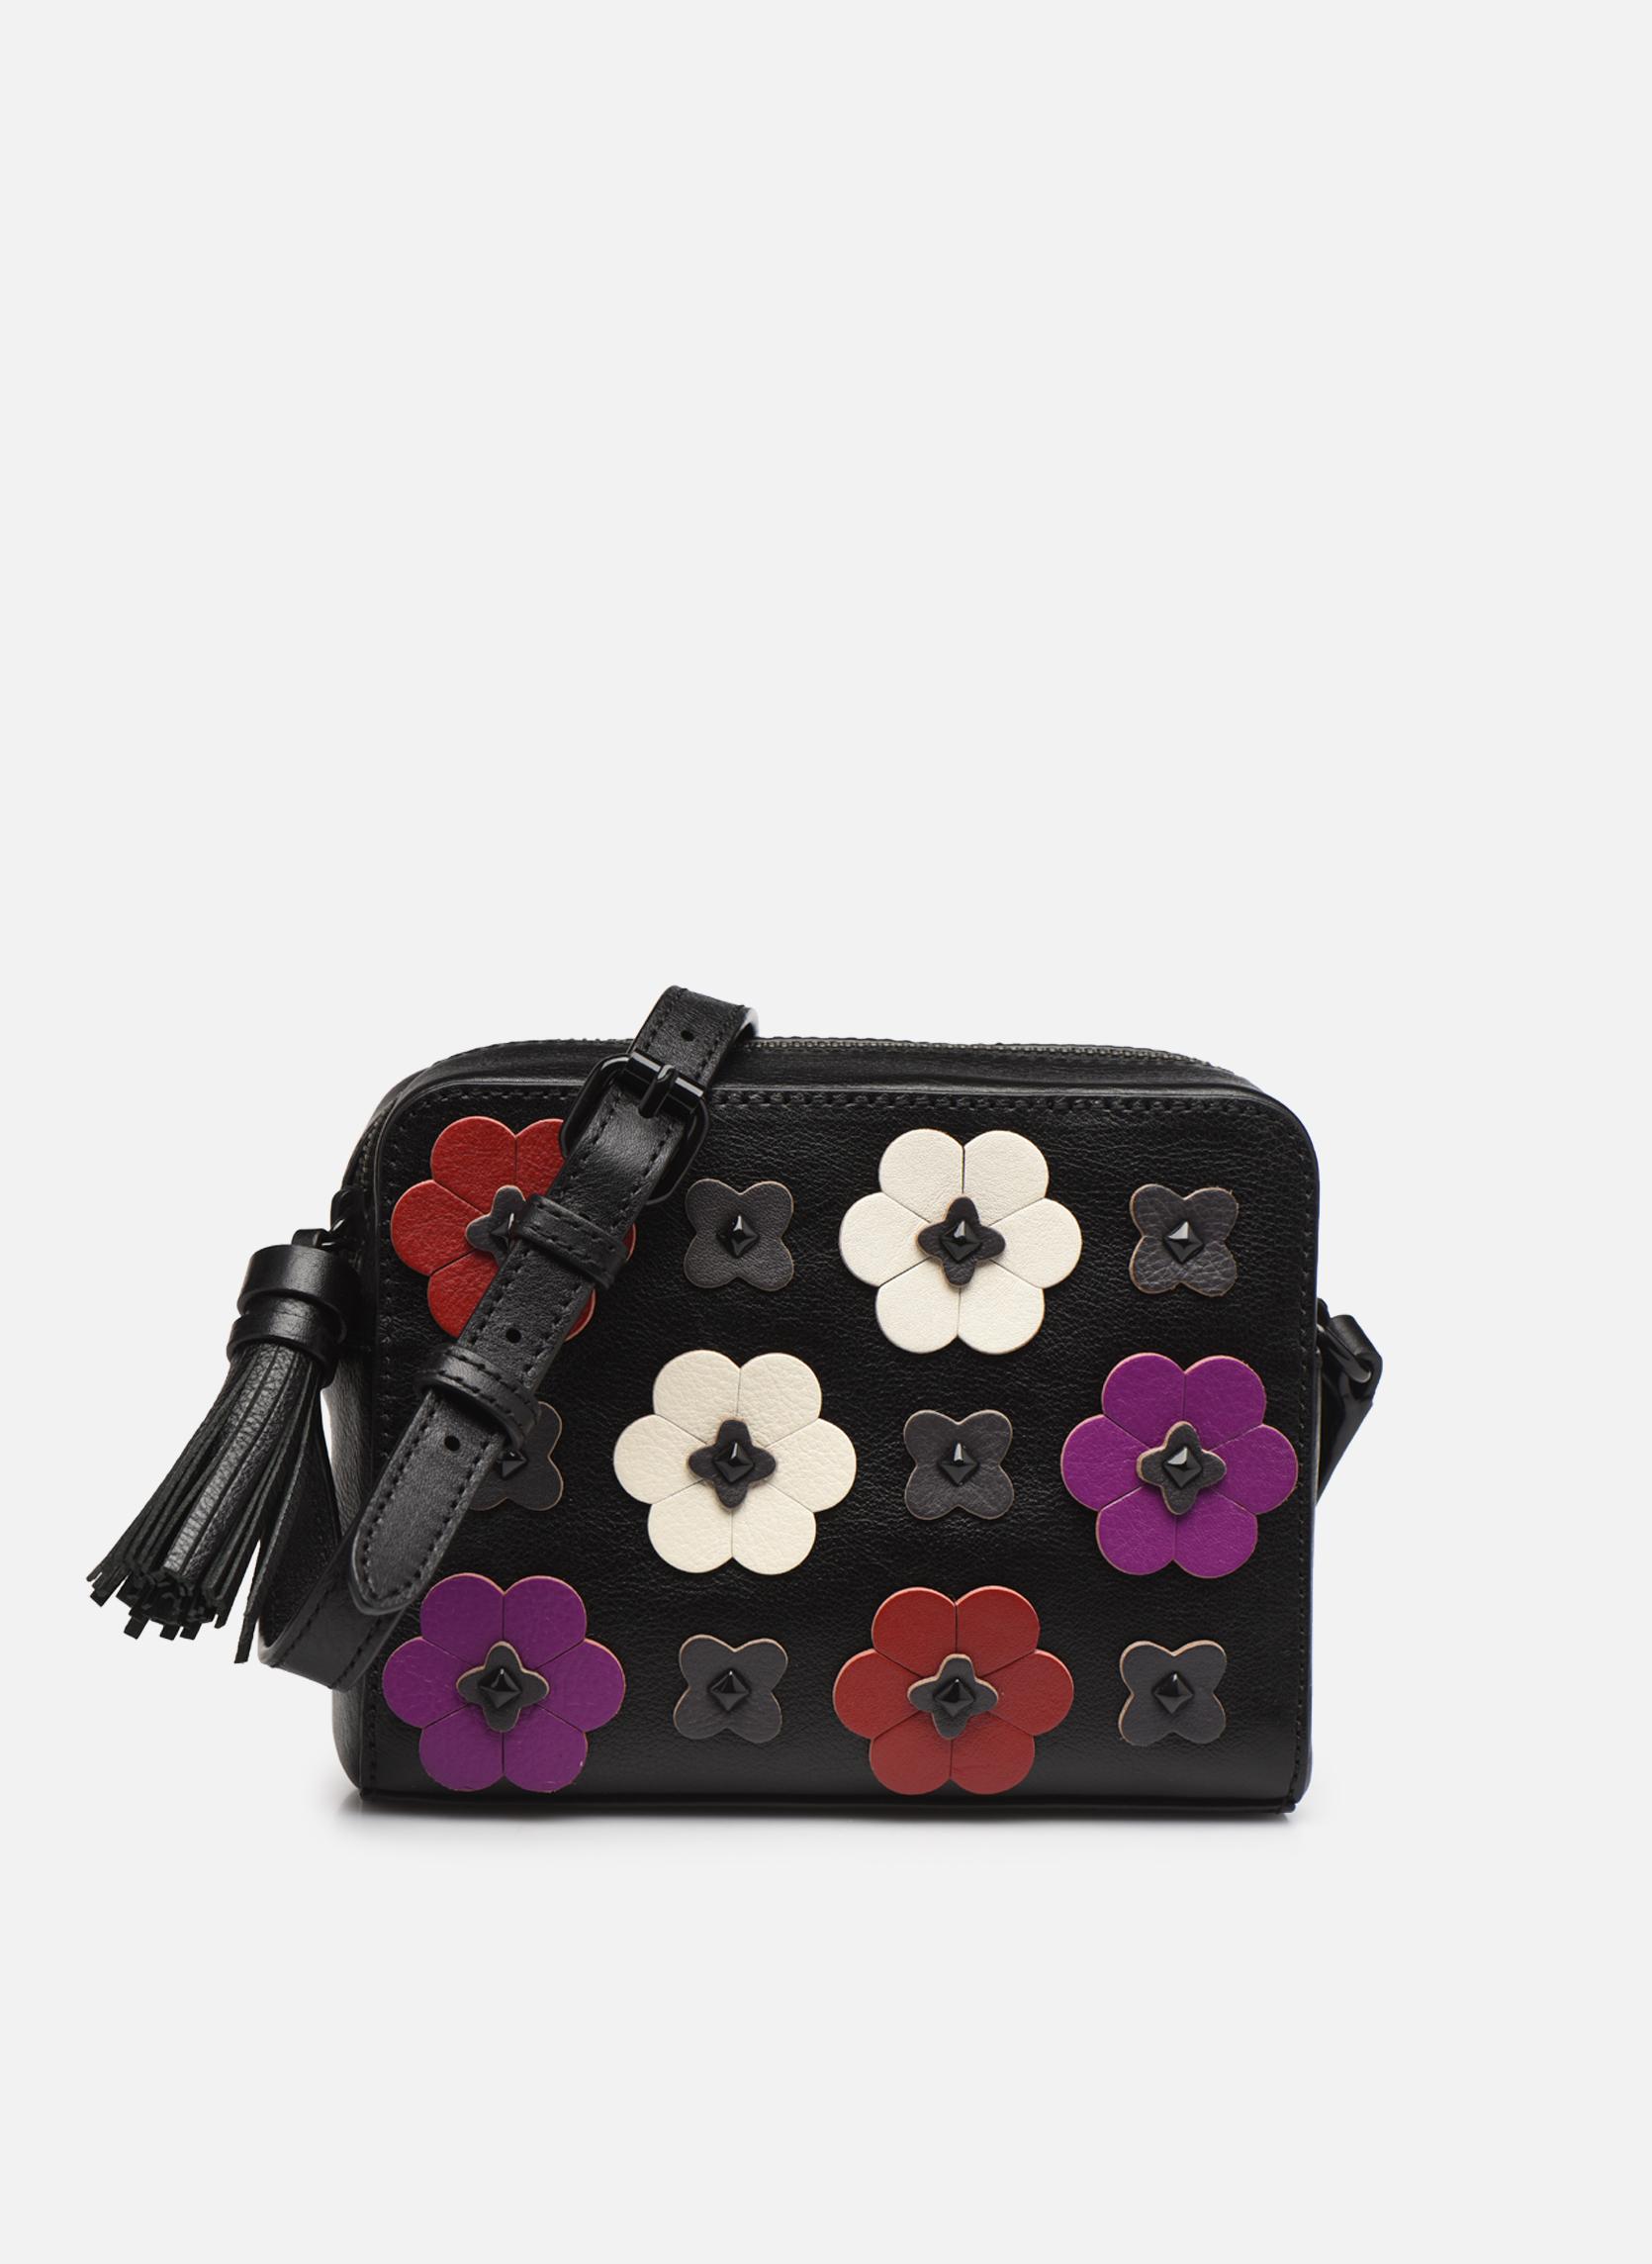 Floral Applique Camera bag by Rebecca Minkoff - rebecca minkoff - sarenza.it